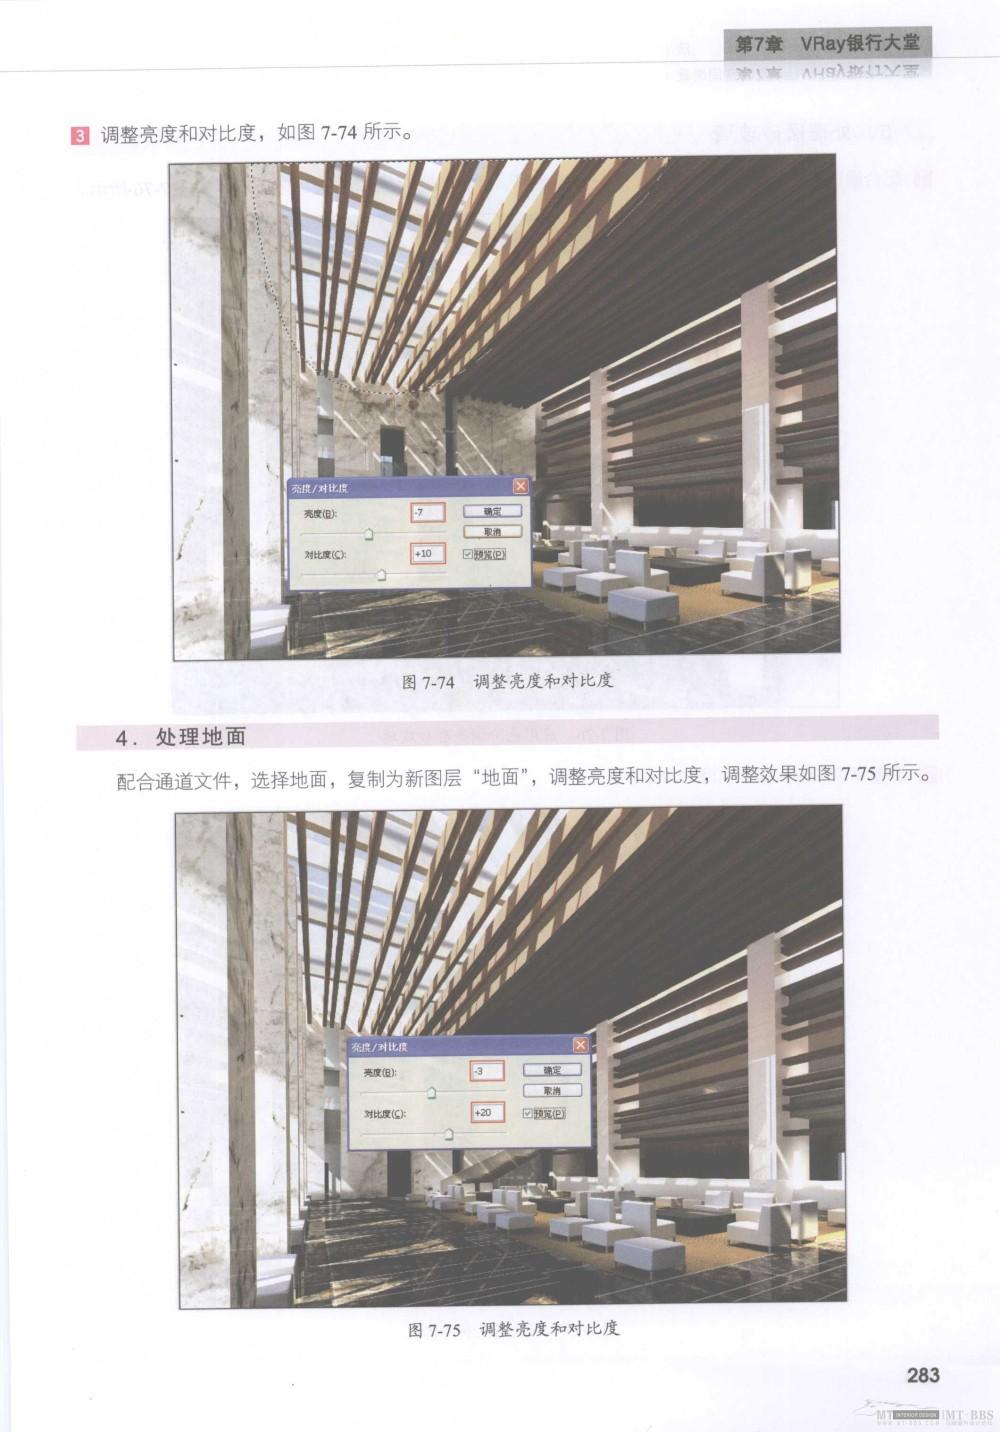 水晶石技法-3ds_Max&VRay室内空间表现_水晶石技法-3ds_Max&VRay室内空间表现_页面_289.jpg